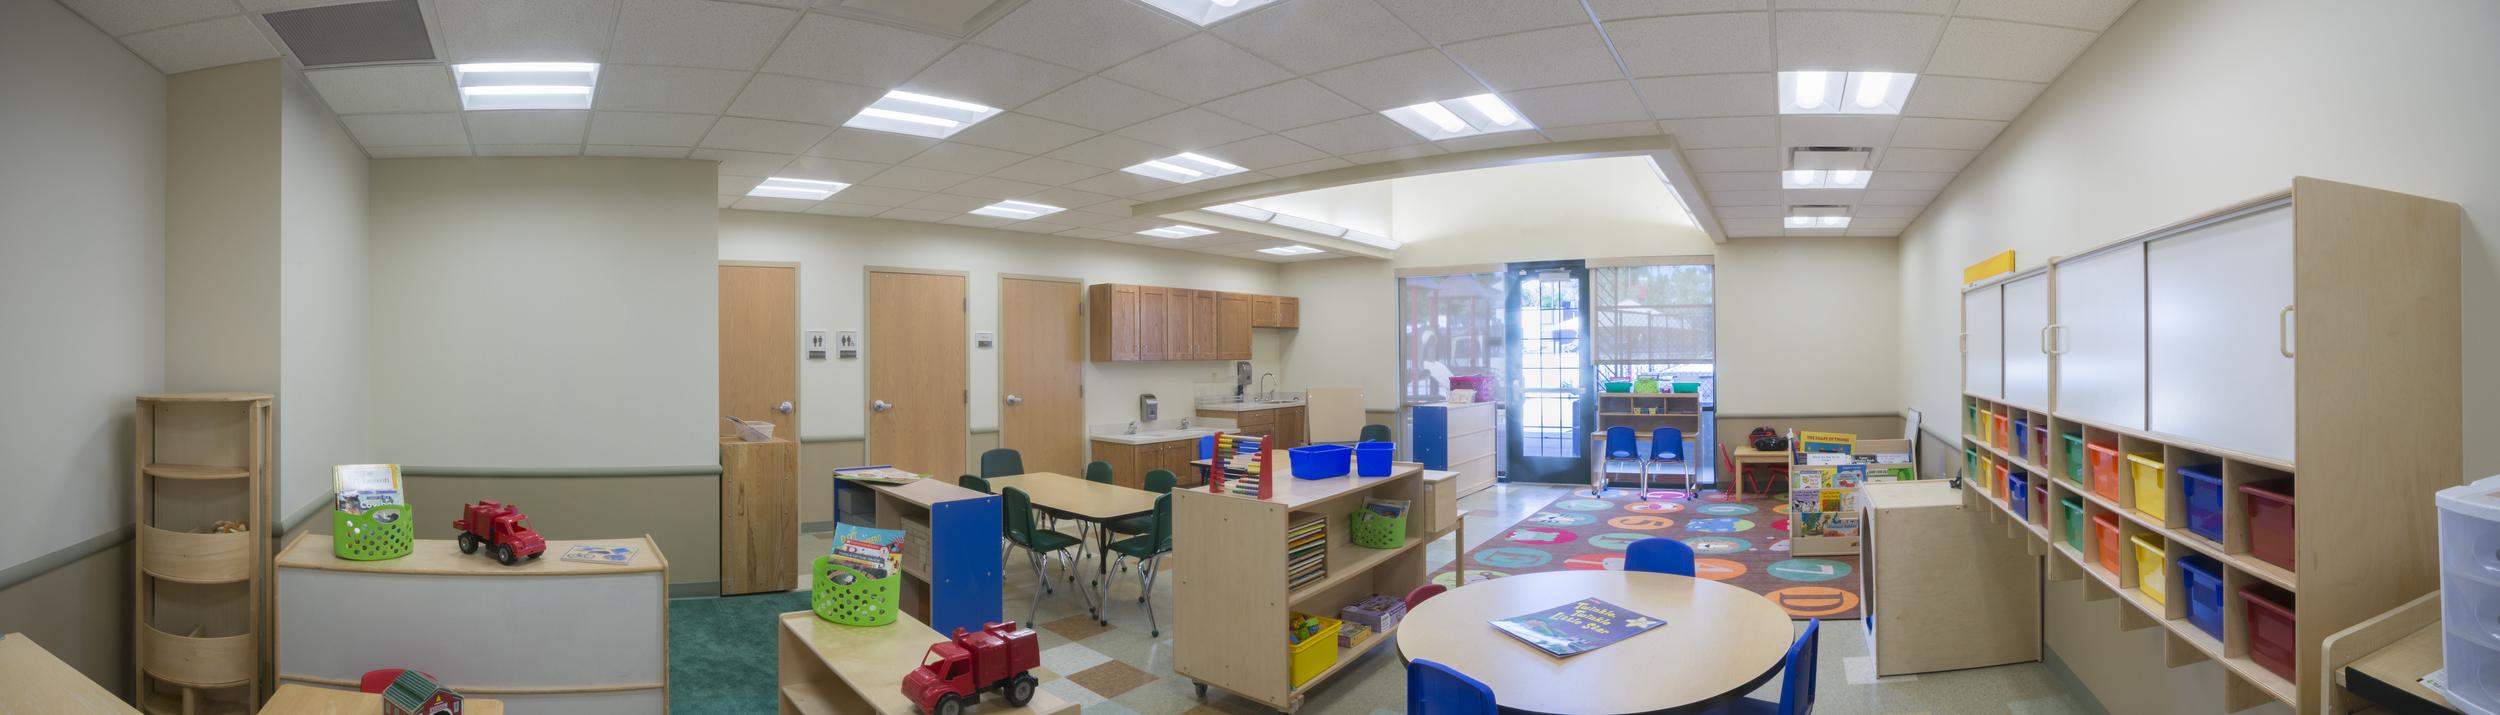 Classroom_Pano.jpg